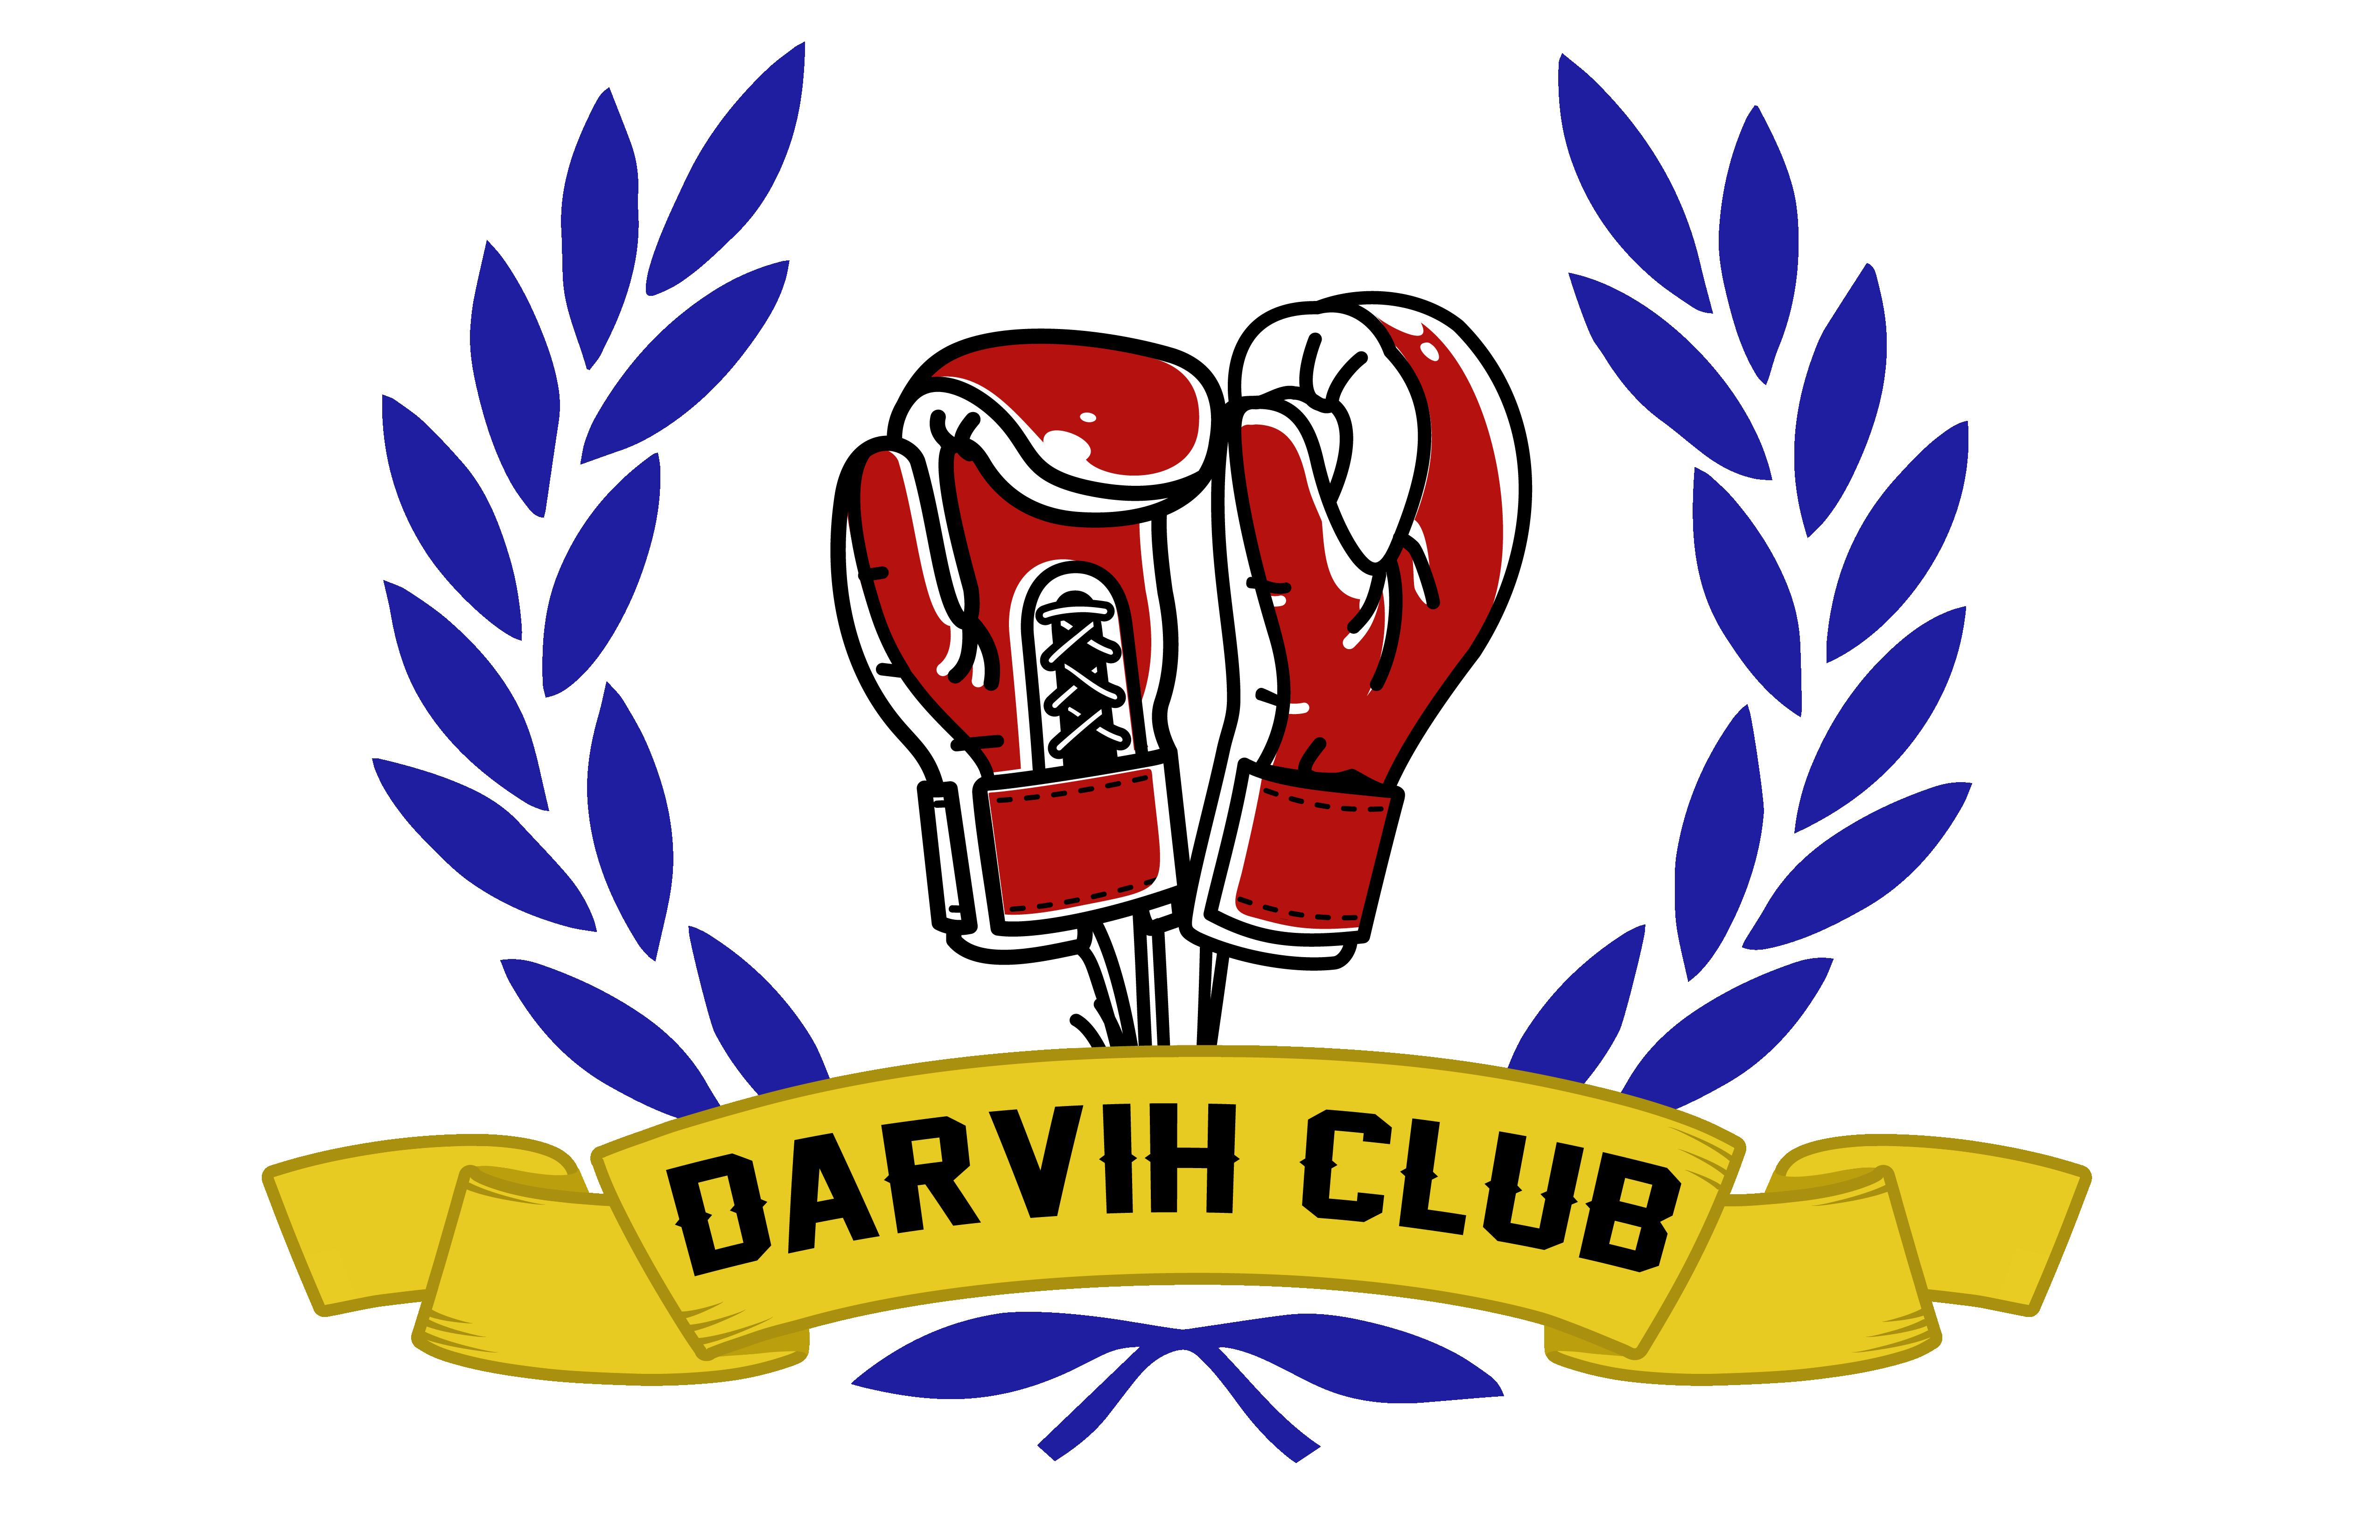 Darvih Club